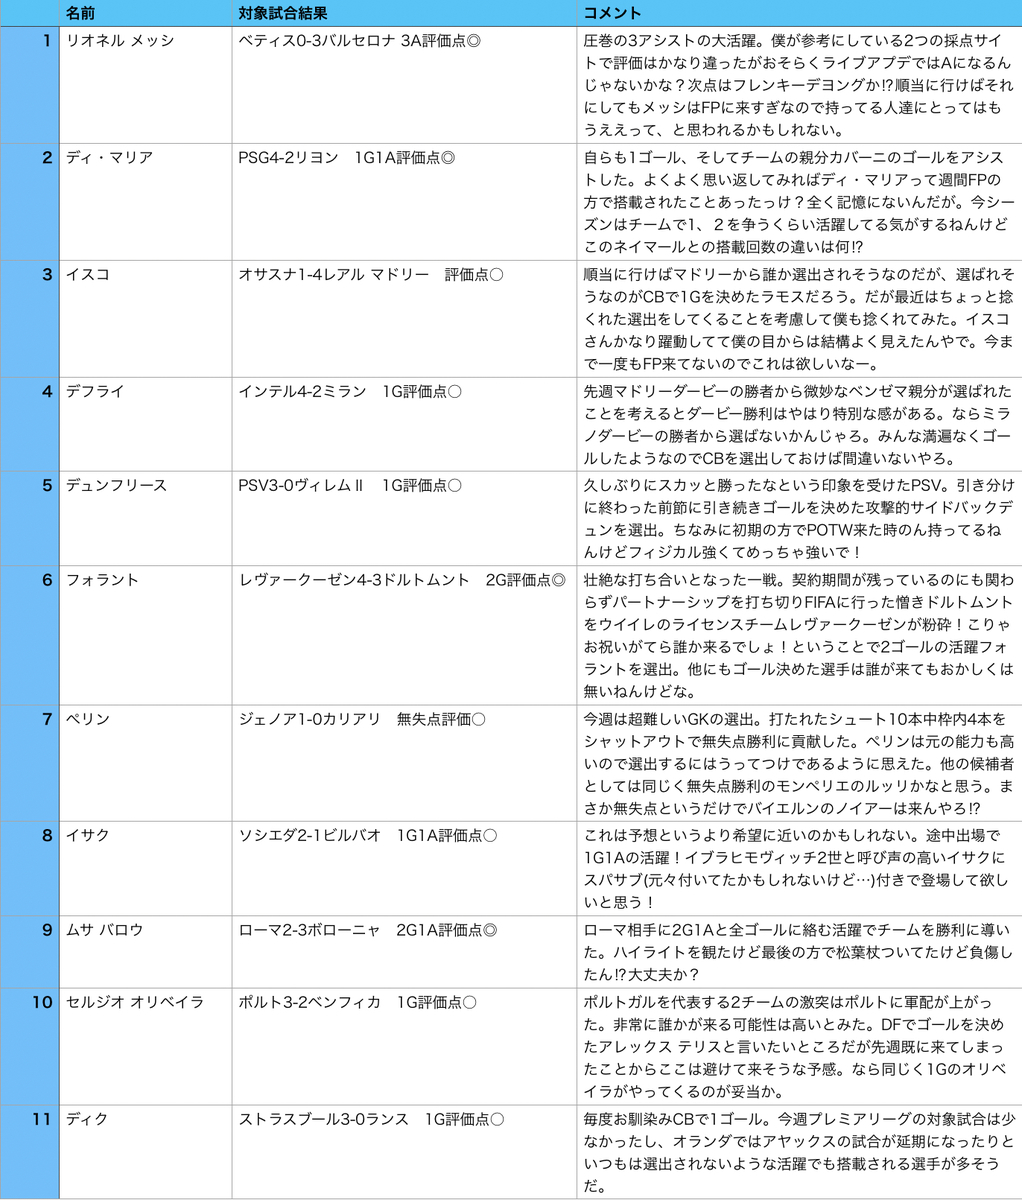 f:id:bokukantoku:20200213222320j:plain